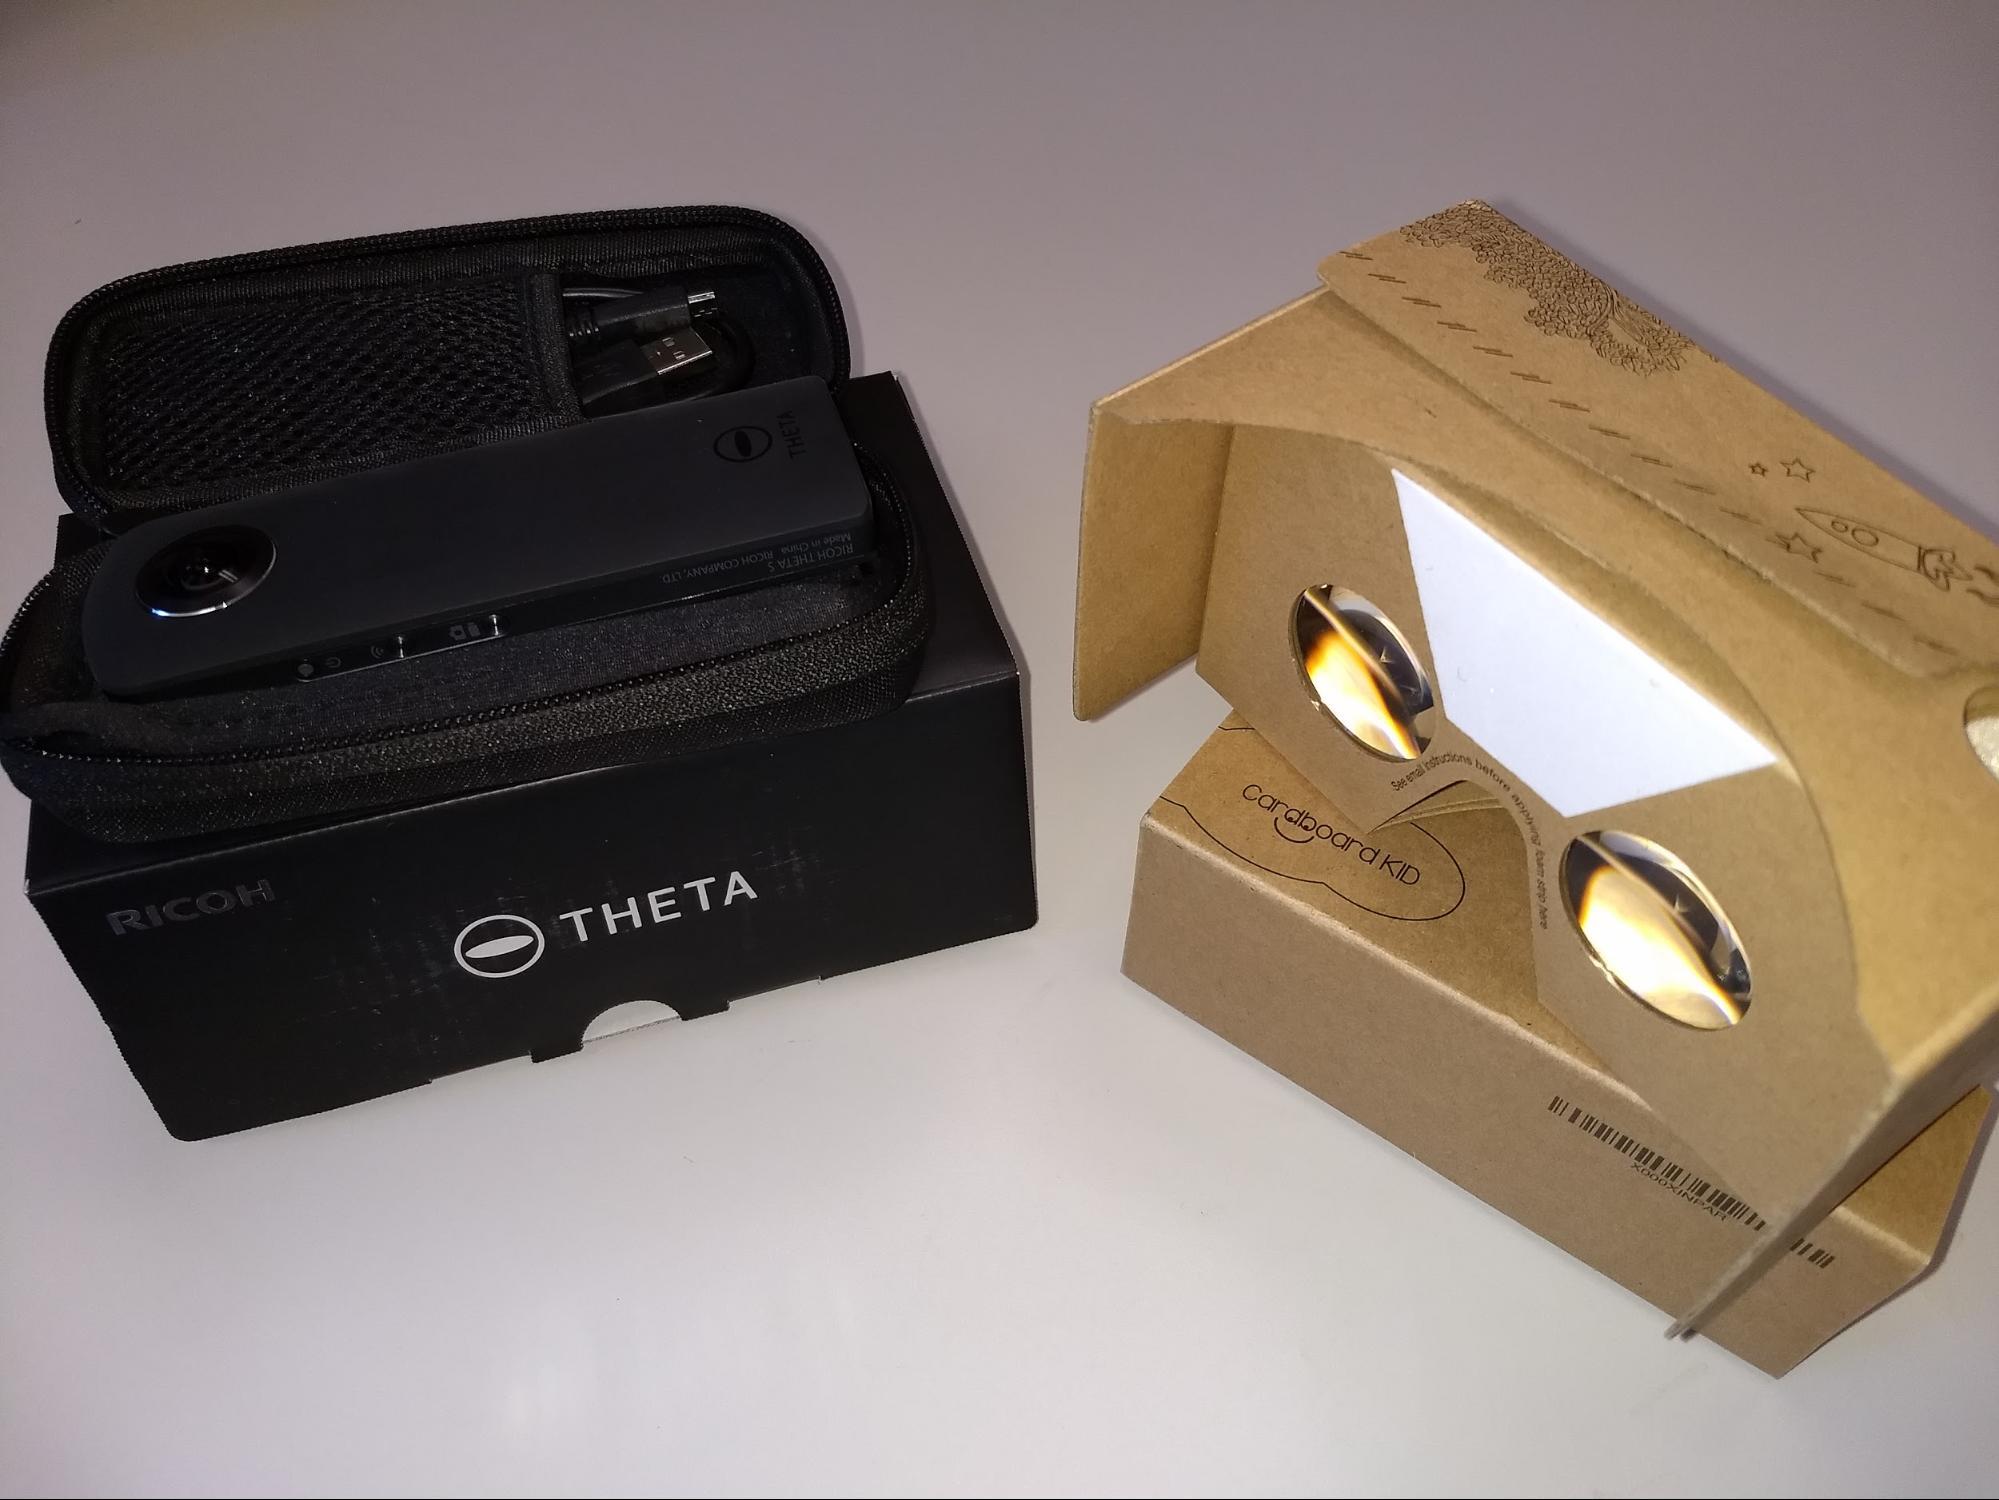 Ricoh Theta 360 camera and Google Cardboard headset